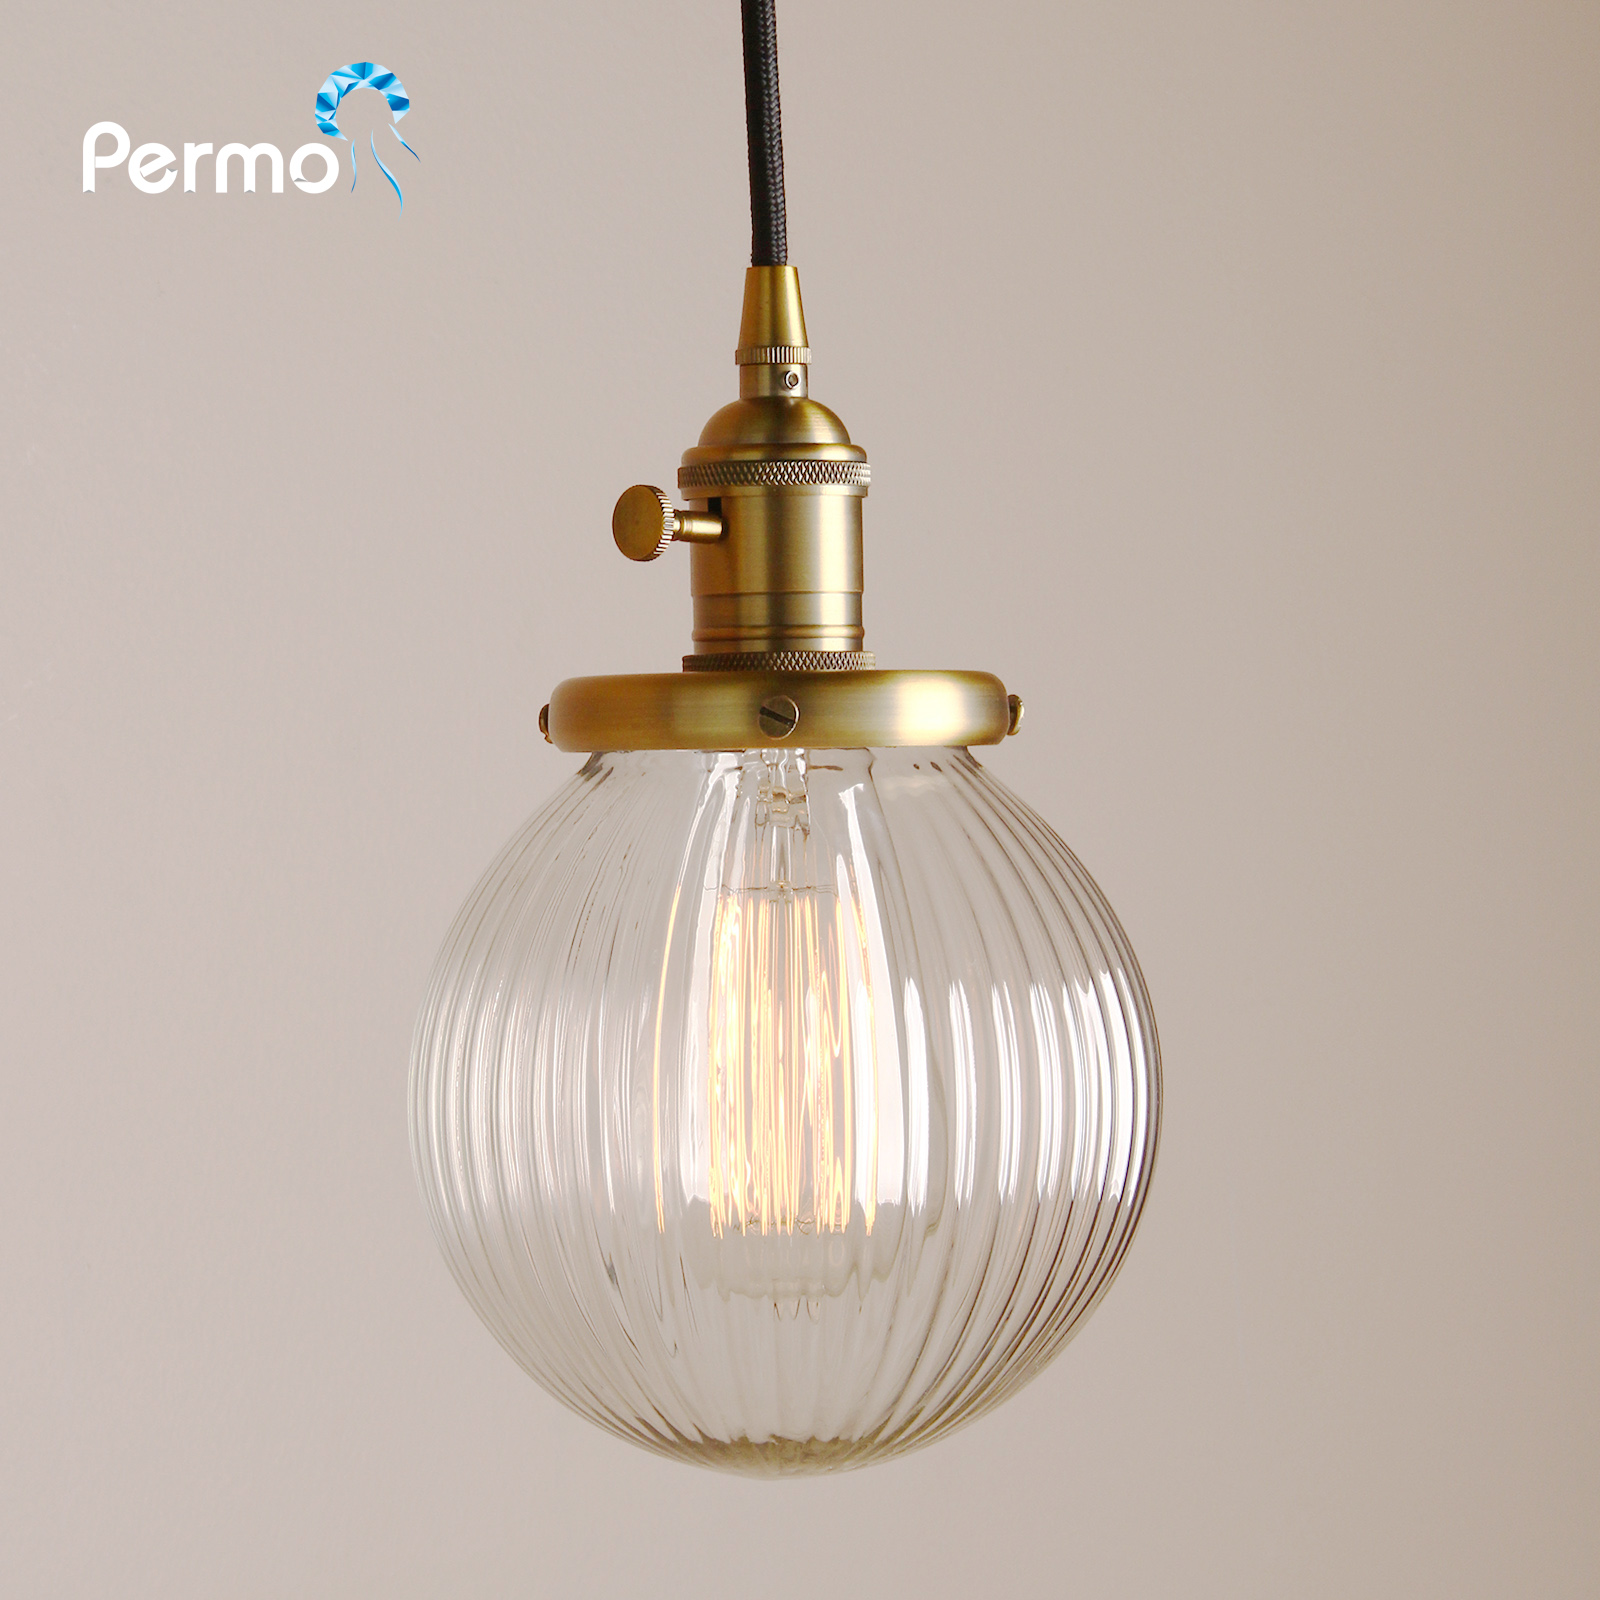 High Quality modern pendant light